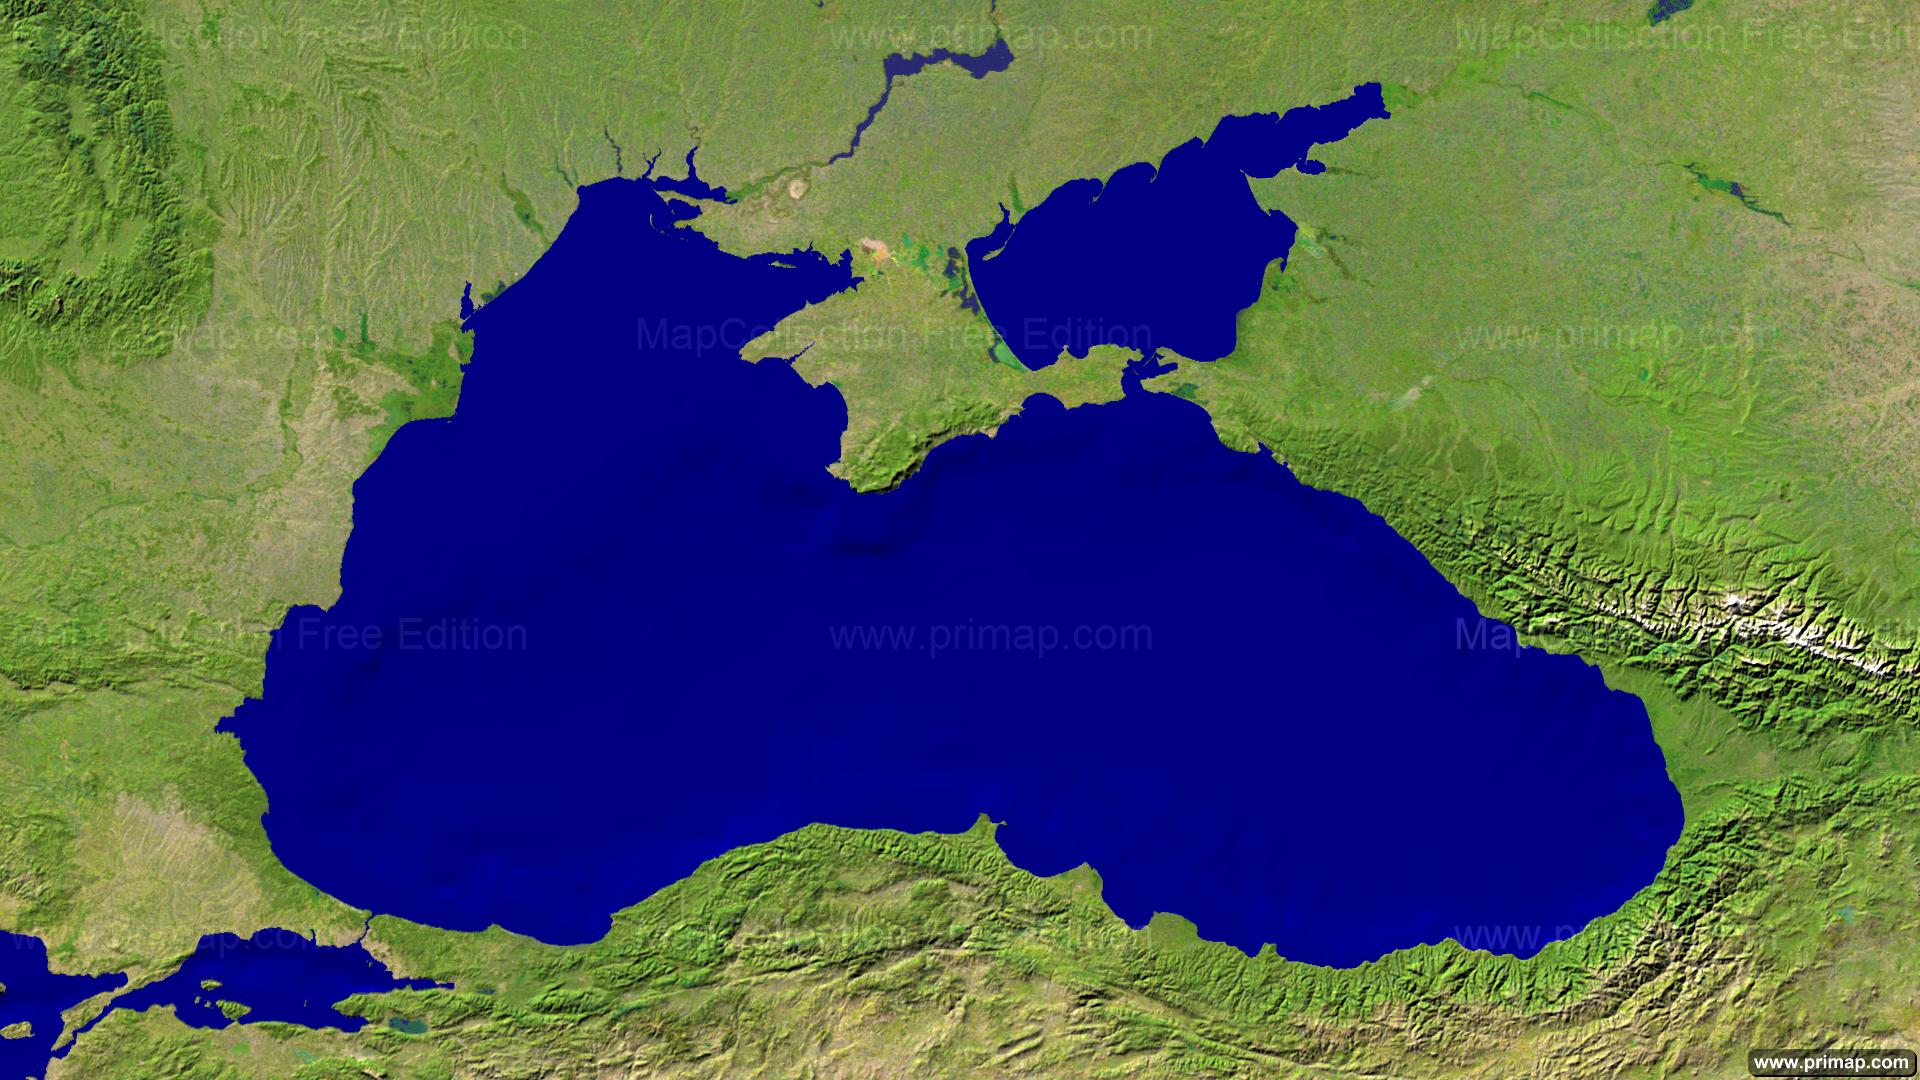 primap Marine charts on